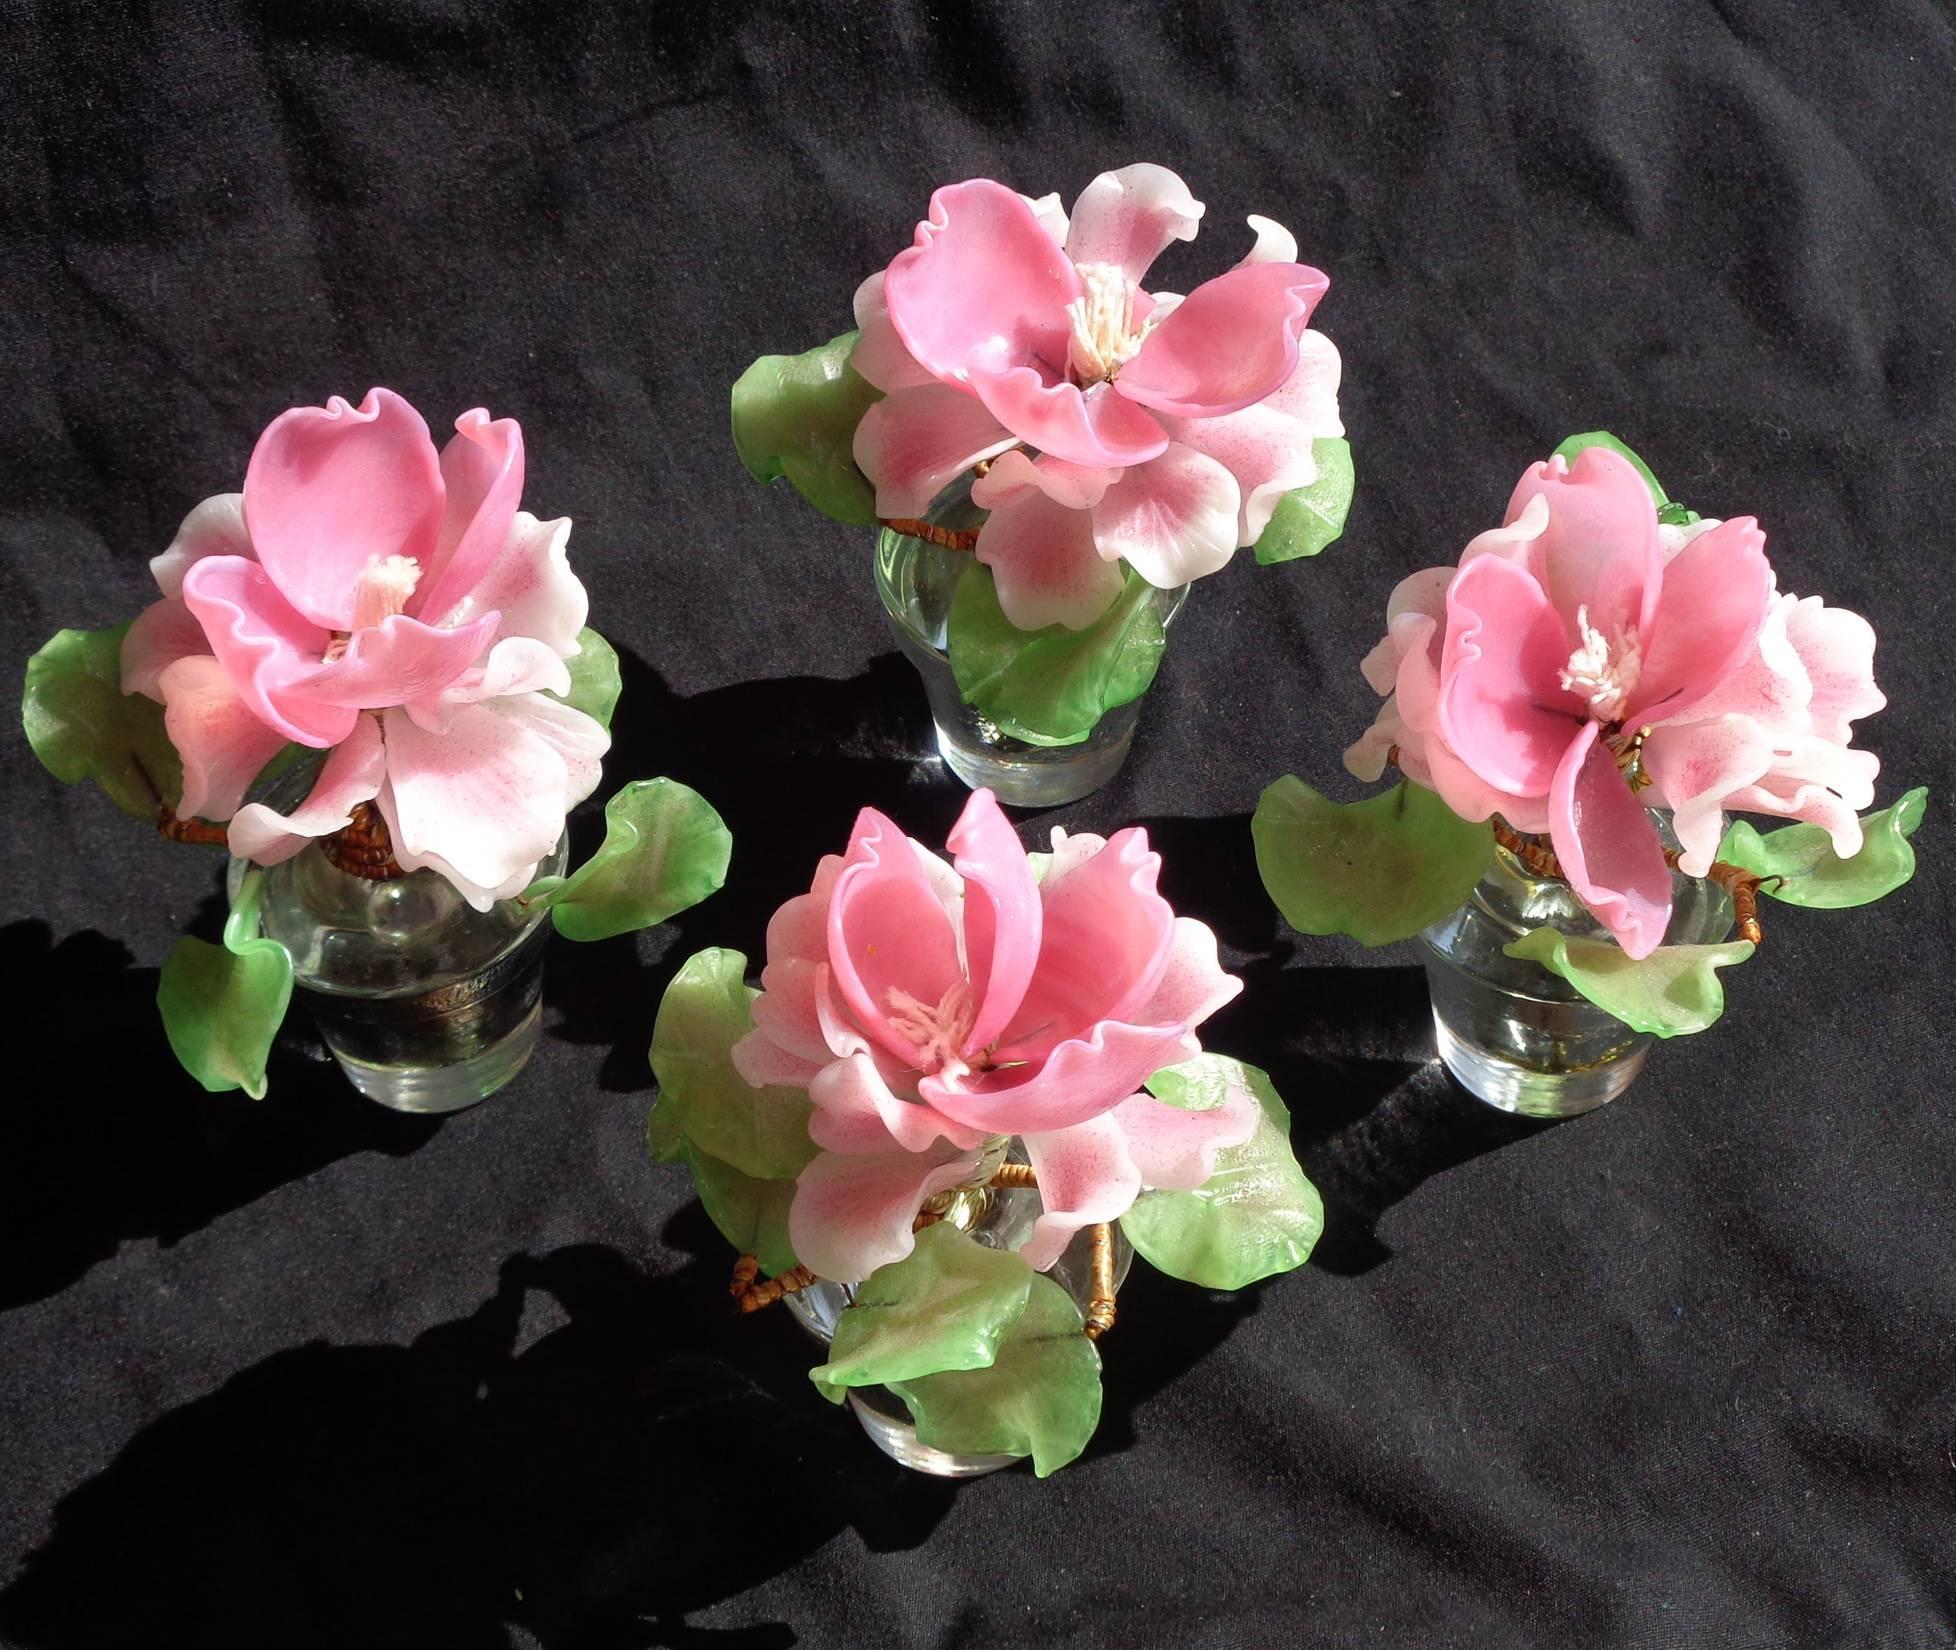 //encrypted-tbn0.gstatic.com/images?q\u003dtbnANd9GcRBgbg8ehi_jF4GVYD8491IdlQx3BS-AY1t2Lv7lD_9YEQ2i6xlQw\u0026s & Barovier Toso Italian Murano Pink Gold Art Glass Leaf Mini Flower Vase Dish